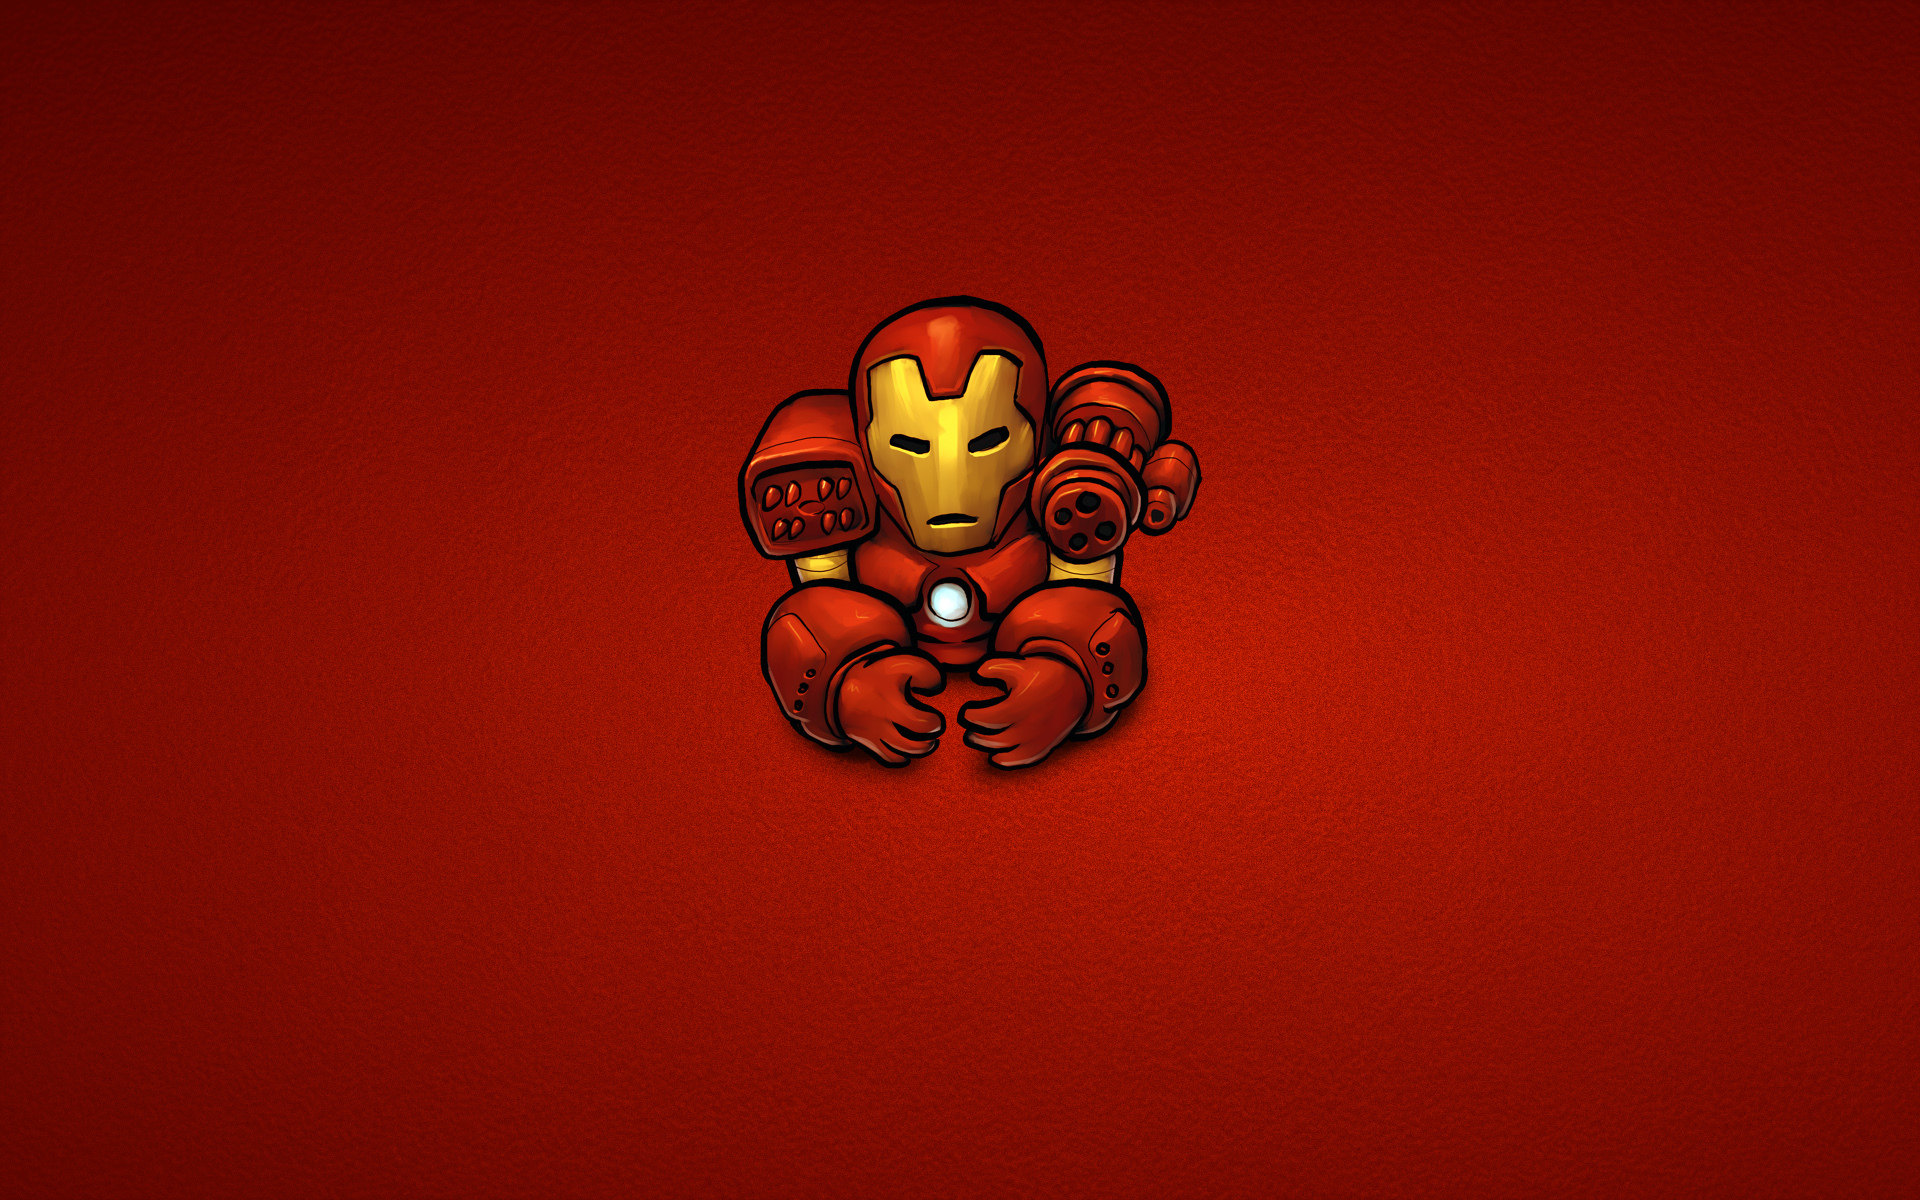 Ironman Ironman Comics Marvel Stahl minimalistisch rot 1920x1200